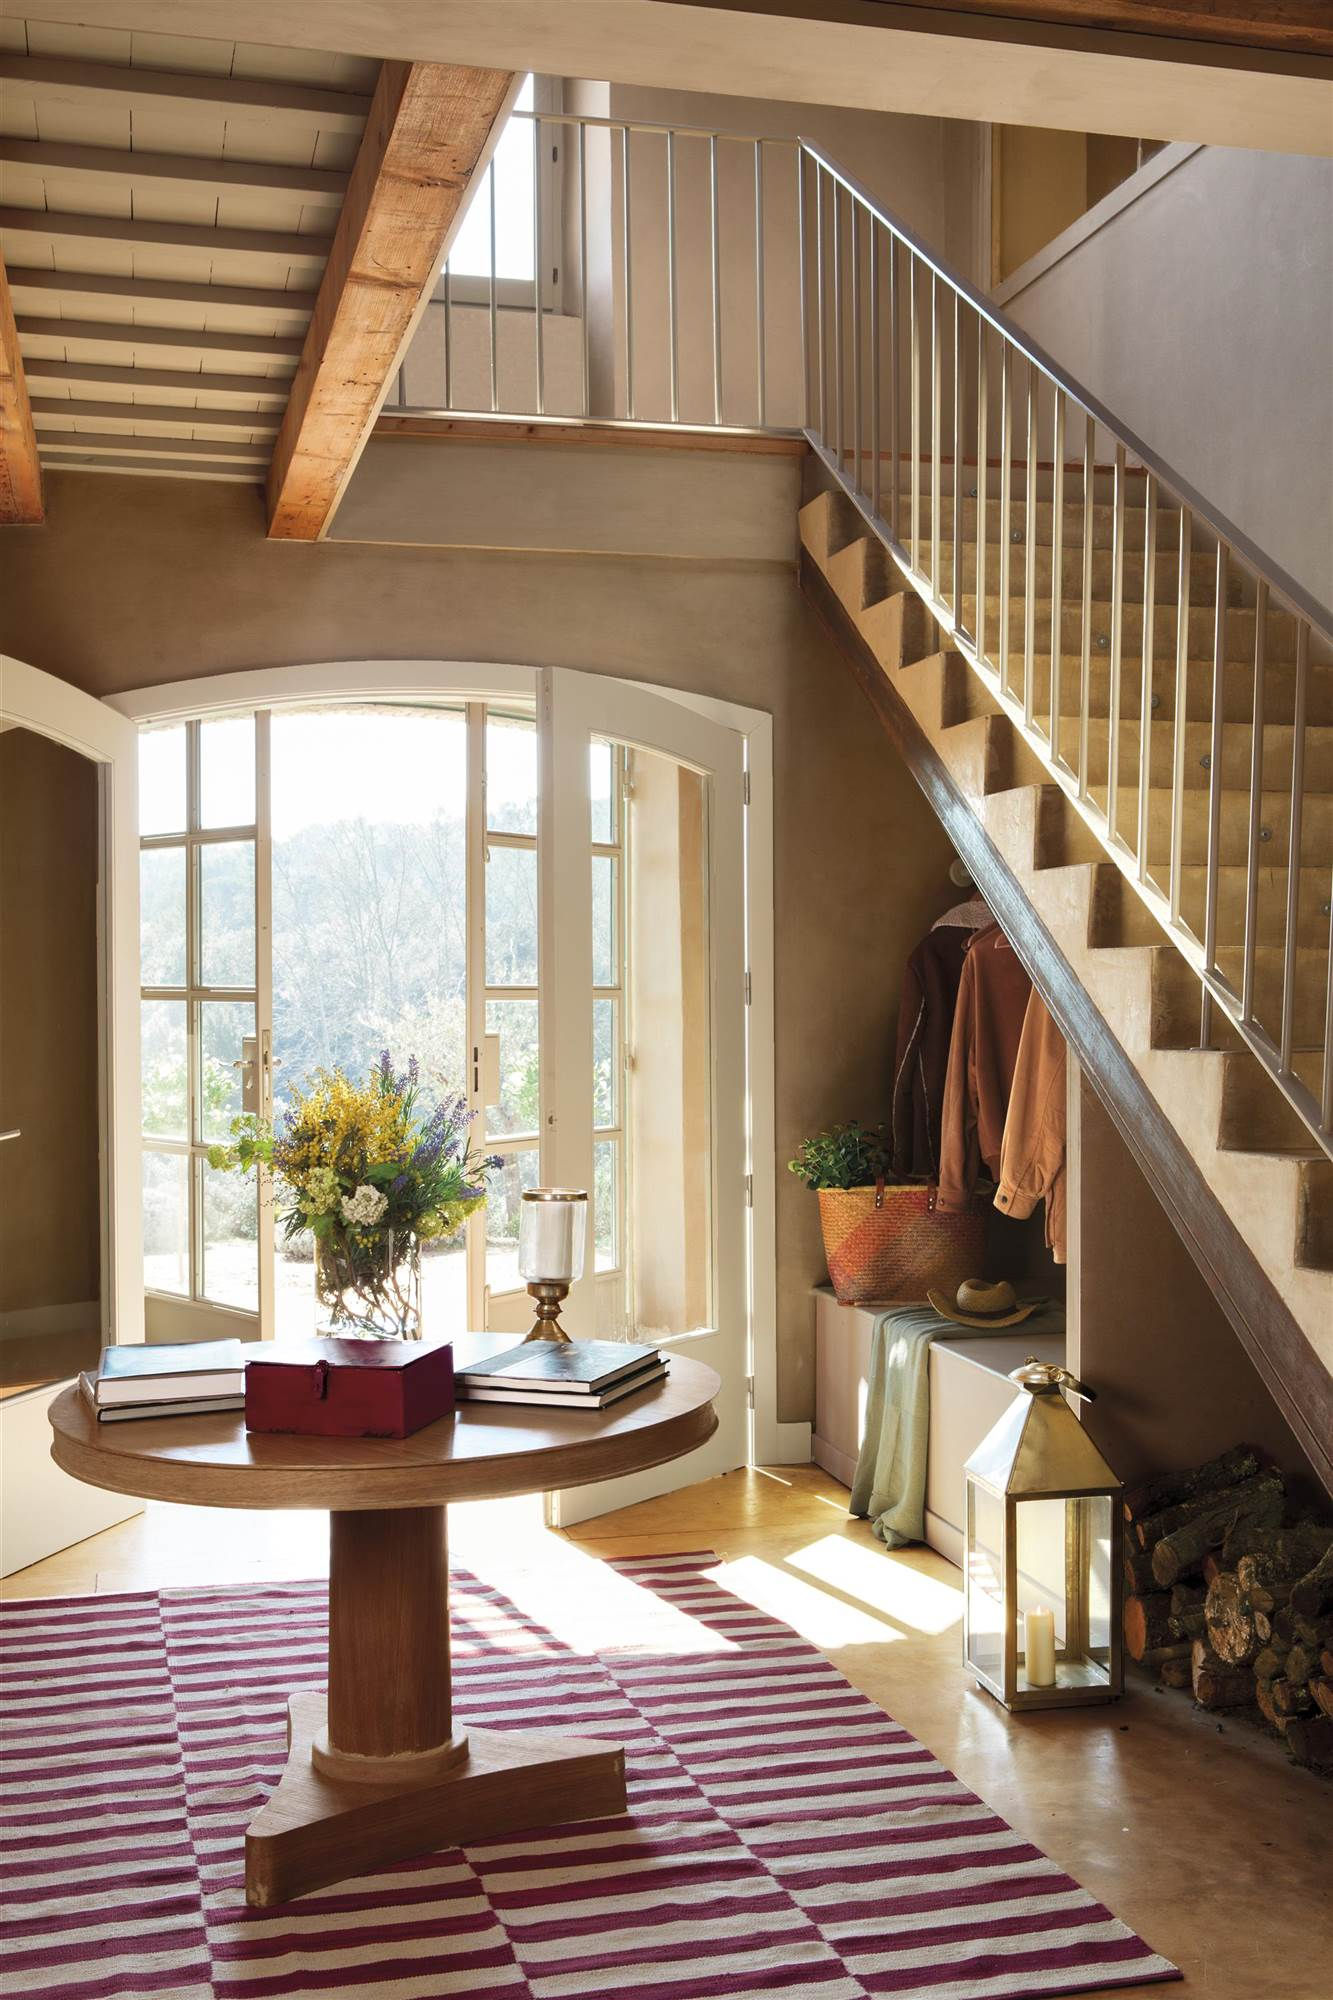 Alfombras para la entrada de casa alfombra alfombra ikea - Casa de alfombras ...